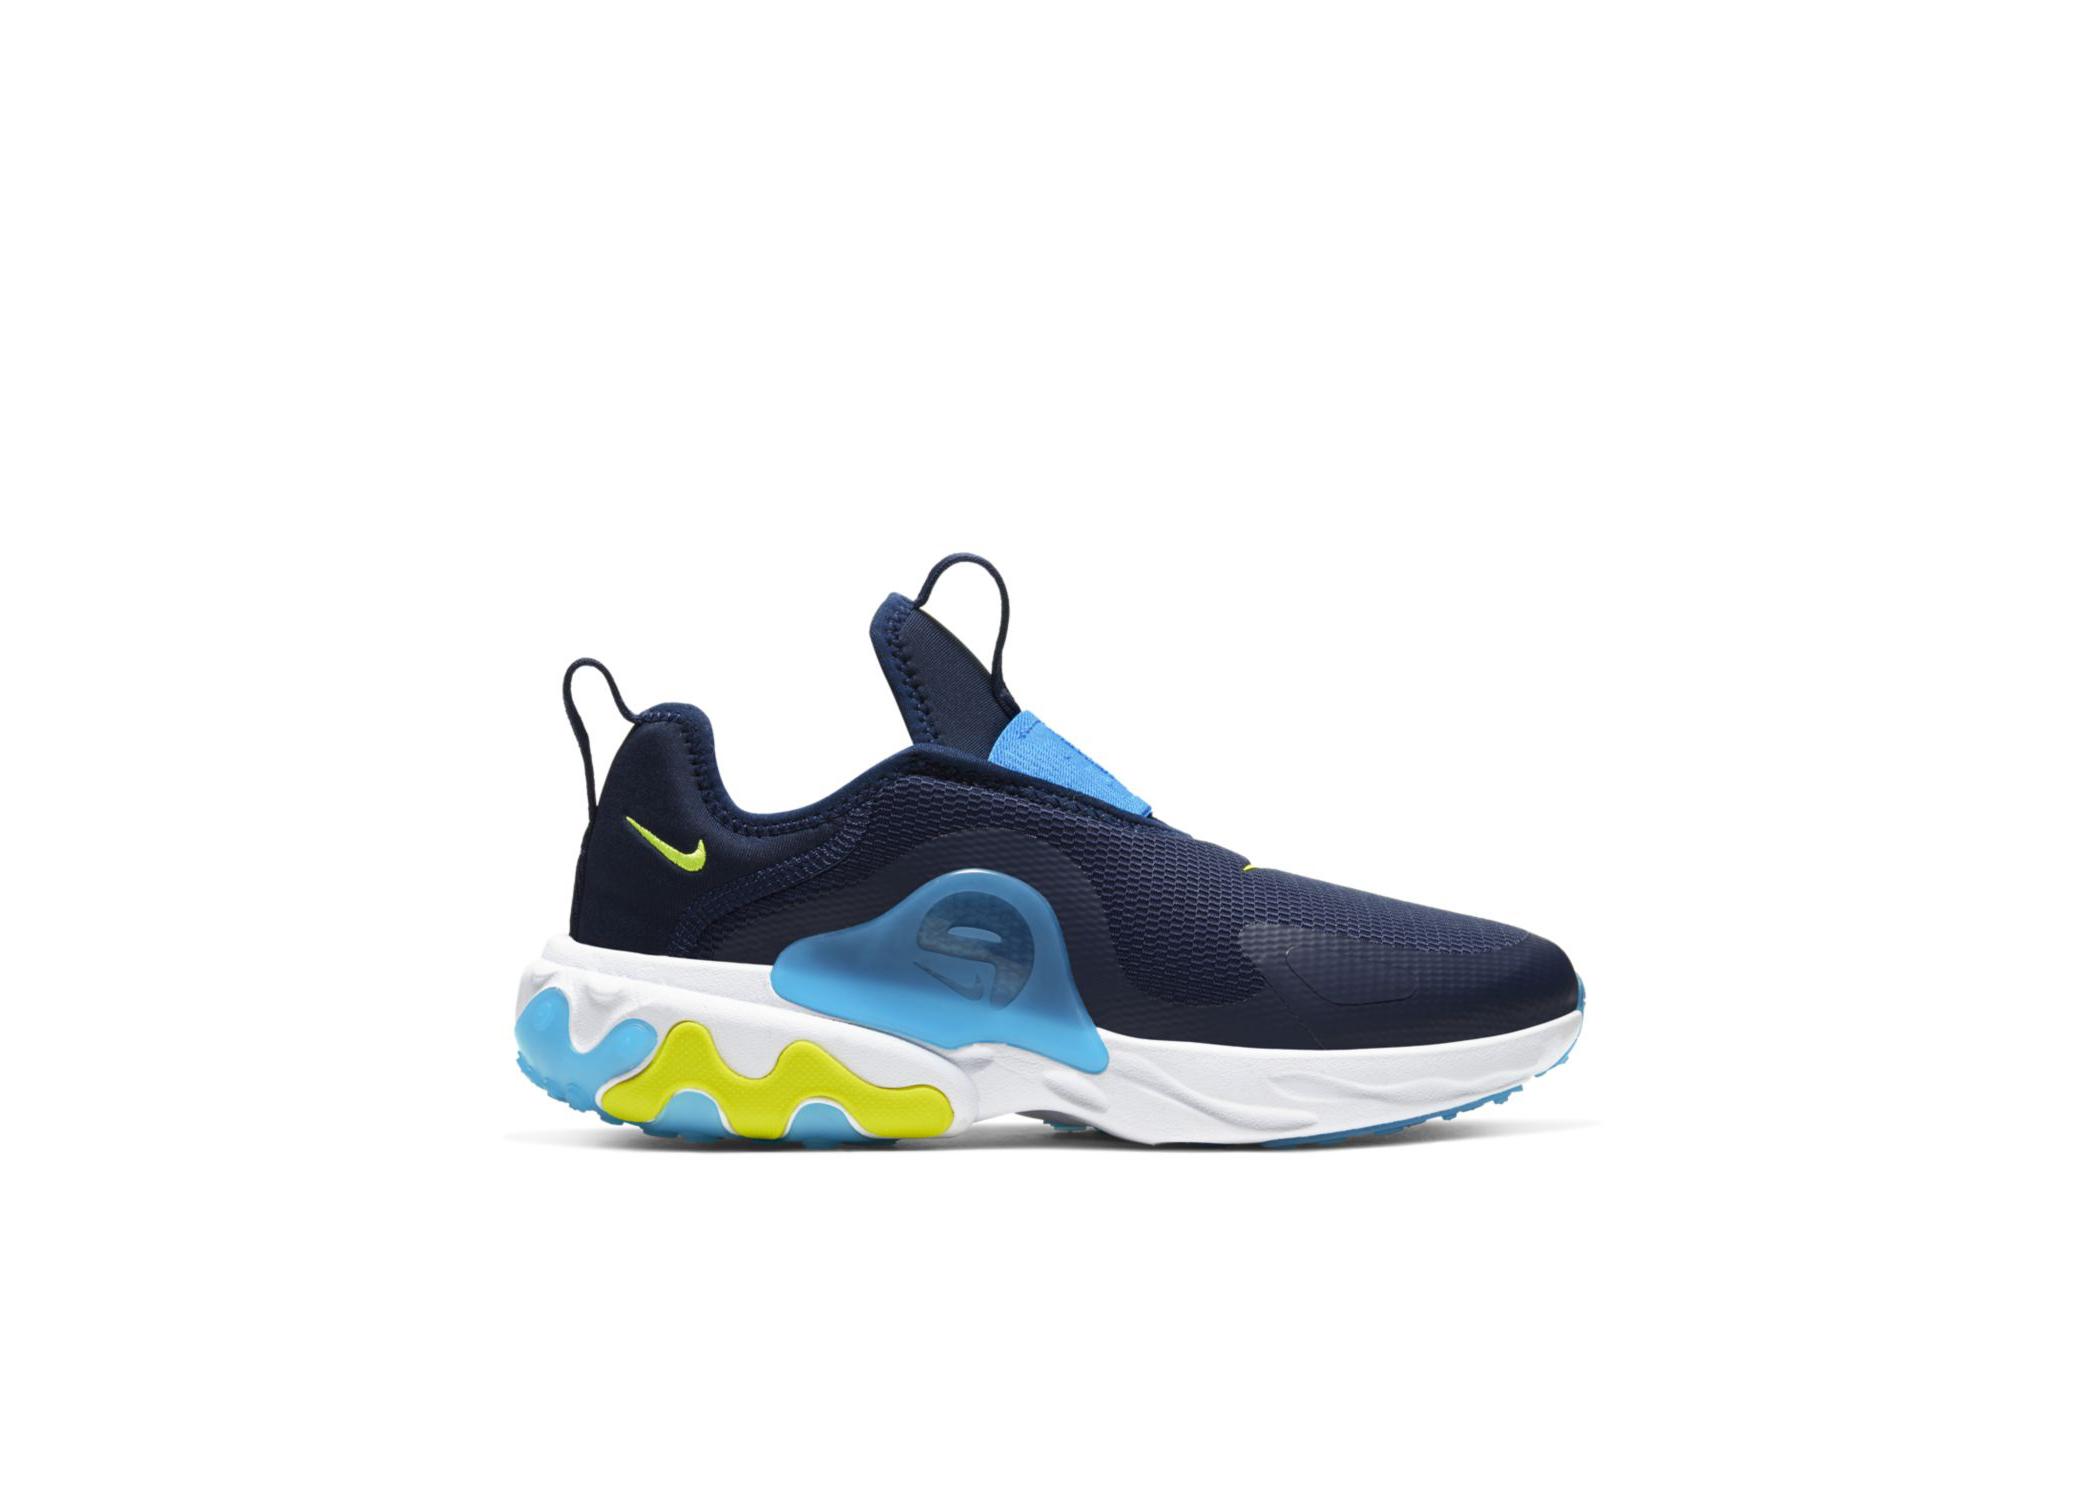 Nike React Presto Extreme Midnight Navy